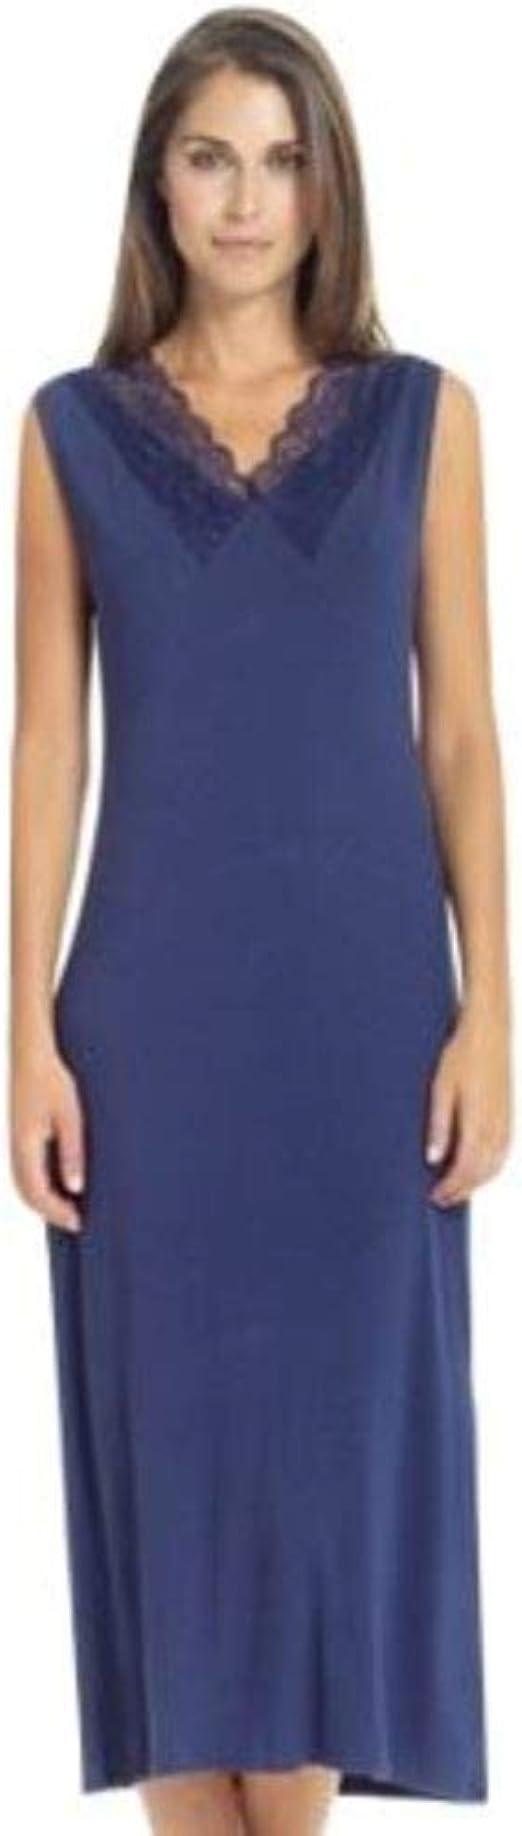 Boglietti - Camisa de Noche para Mujer Azul de Viscosa ...